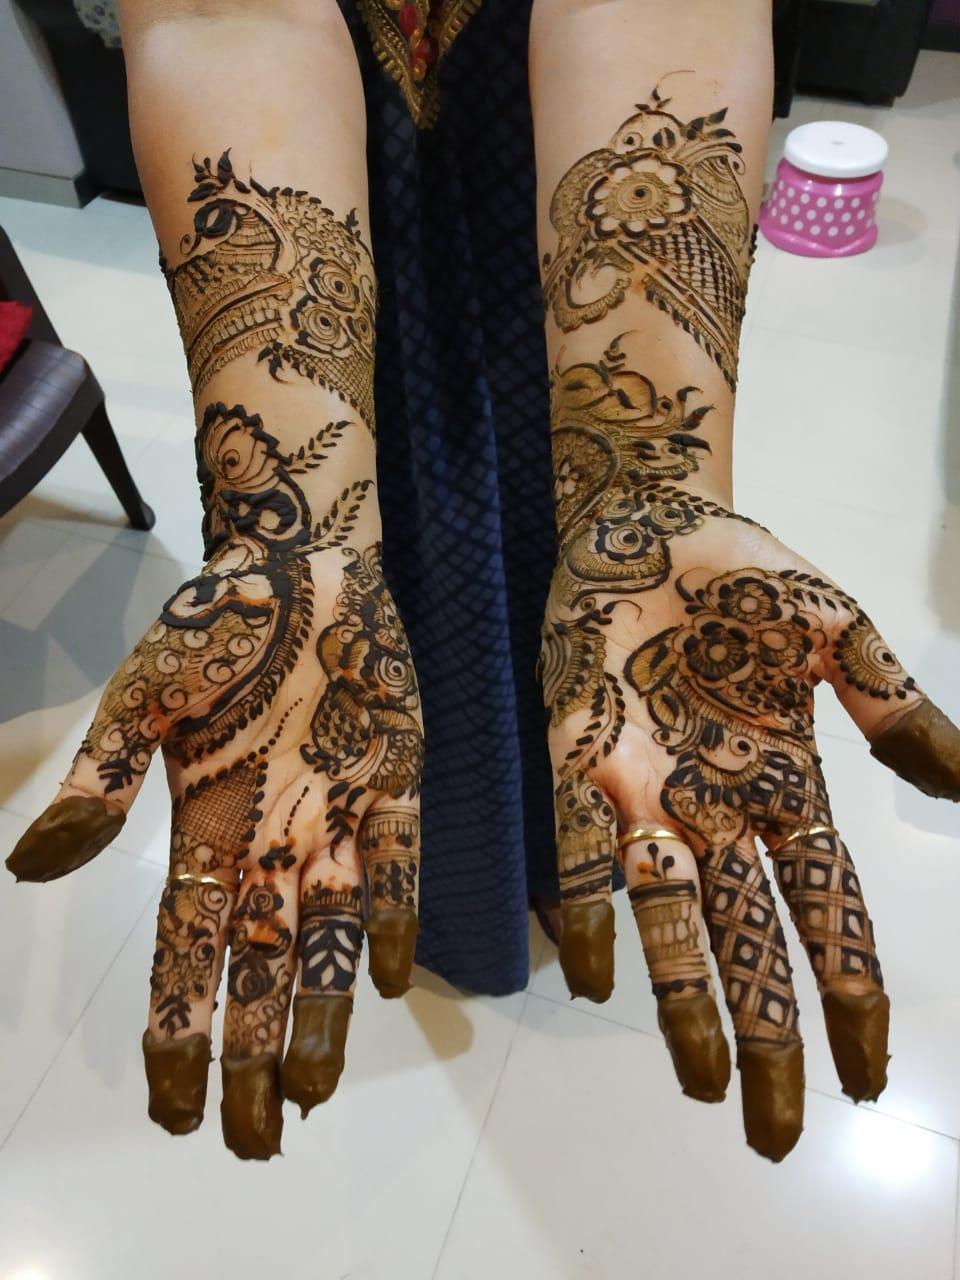 Top 100 Mehendi Courses in Mumbai - Best Henna Classes - Justdial